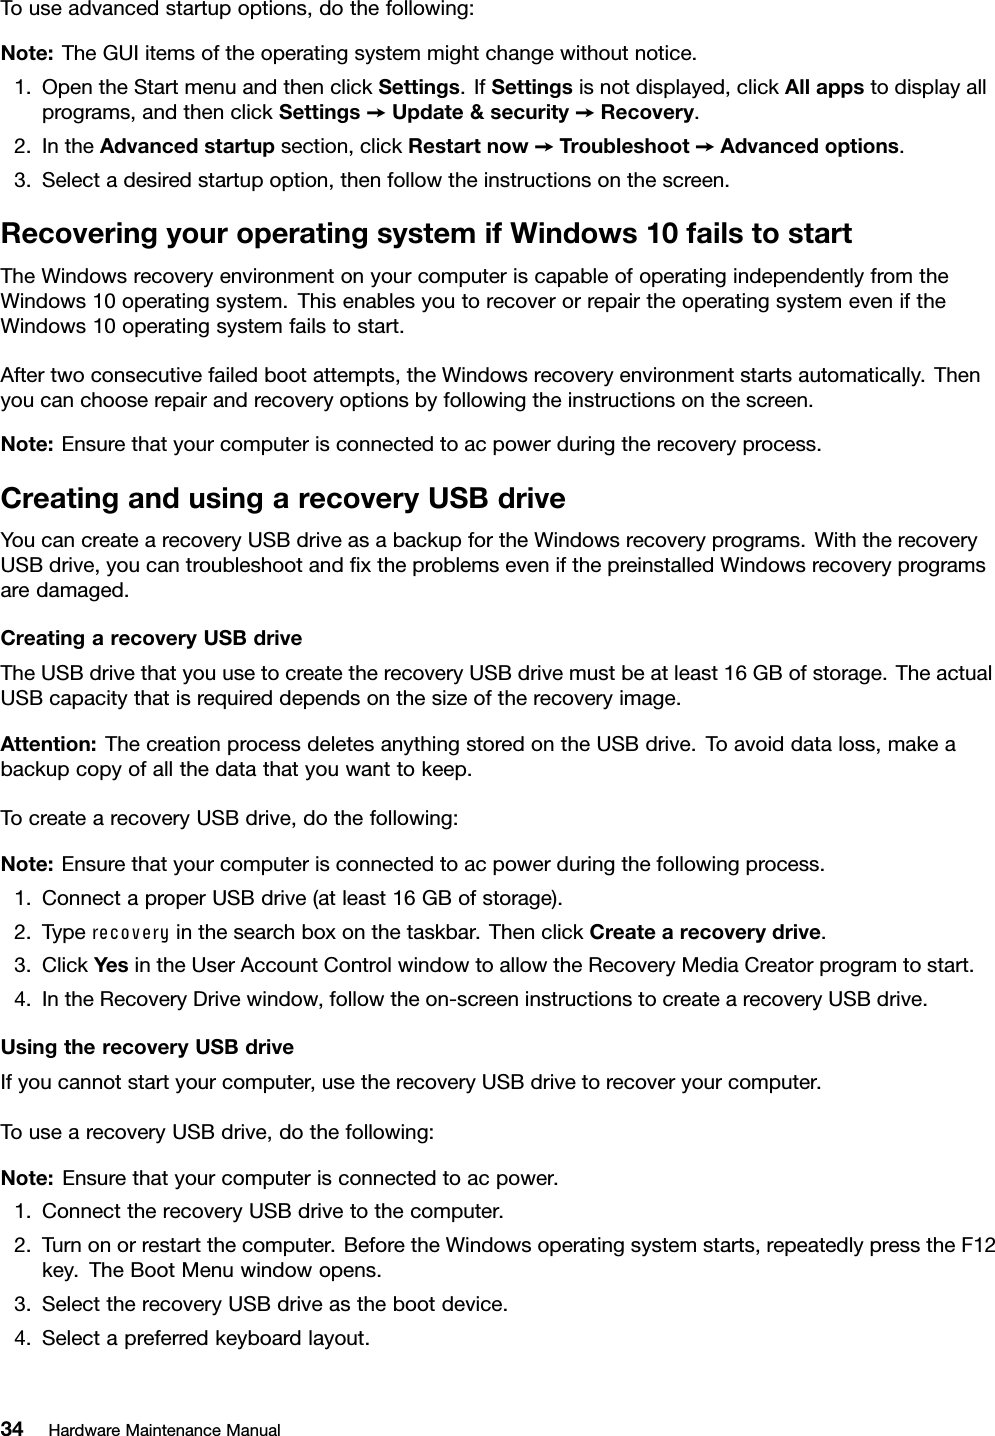 Lenovo T440p Driver Pack Windows 10